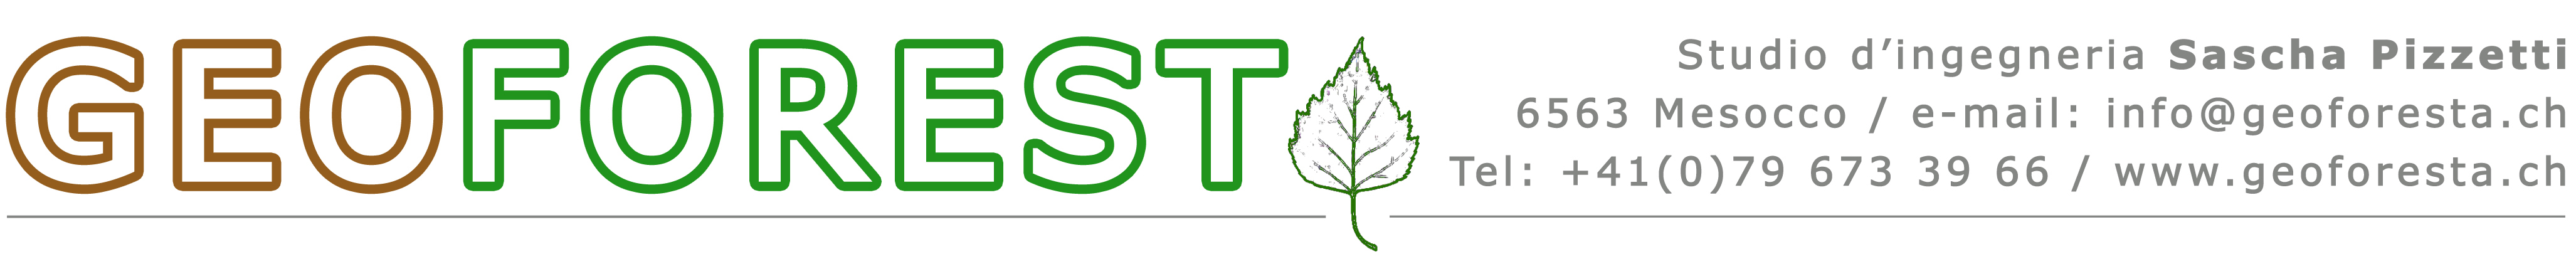 logo_jpgjpg